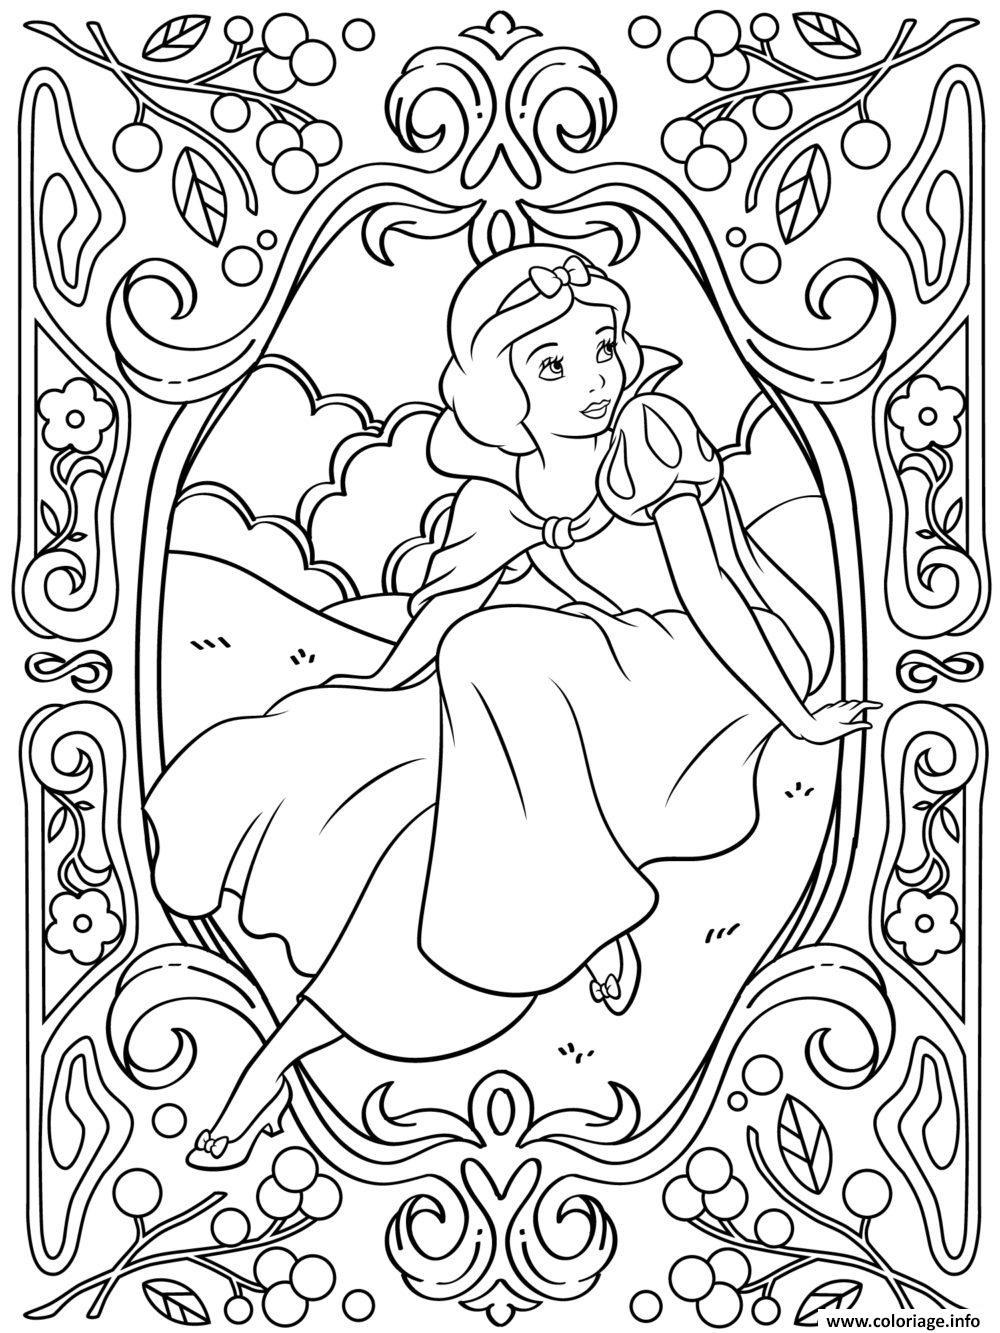 Coloriage Mandala Disney Princesse Blanche Neige Dessin pour Coloriage Princesses Disney À Imprimer